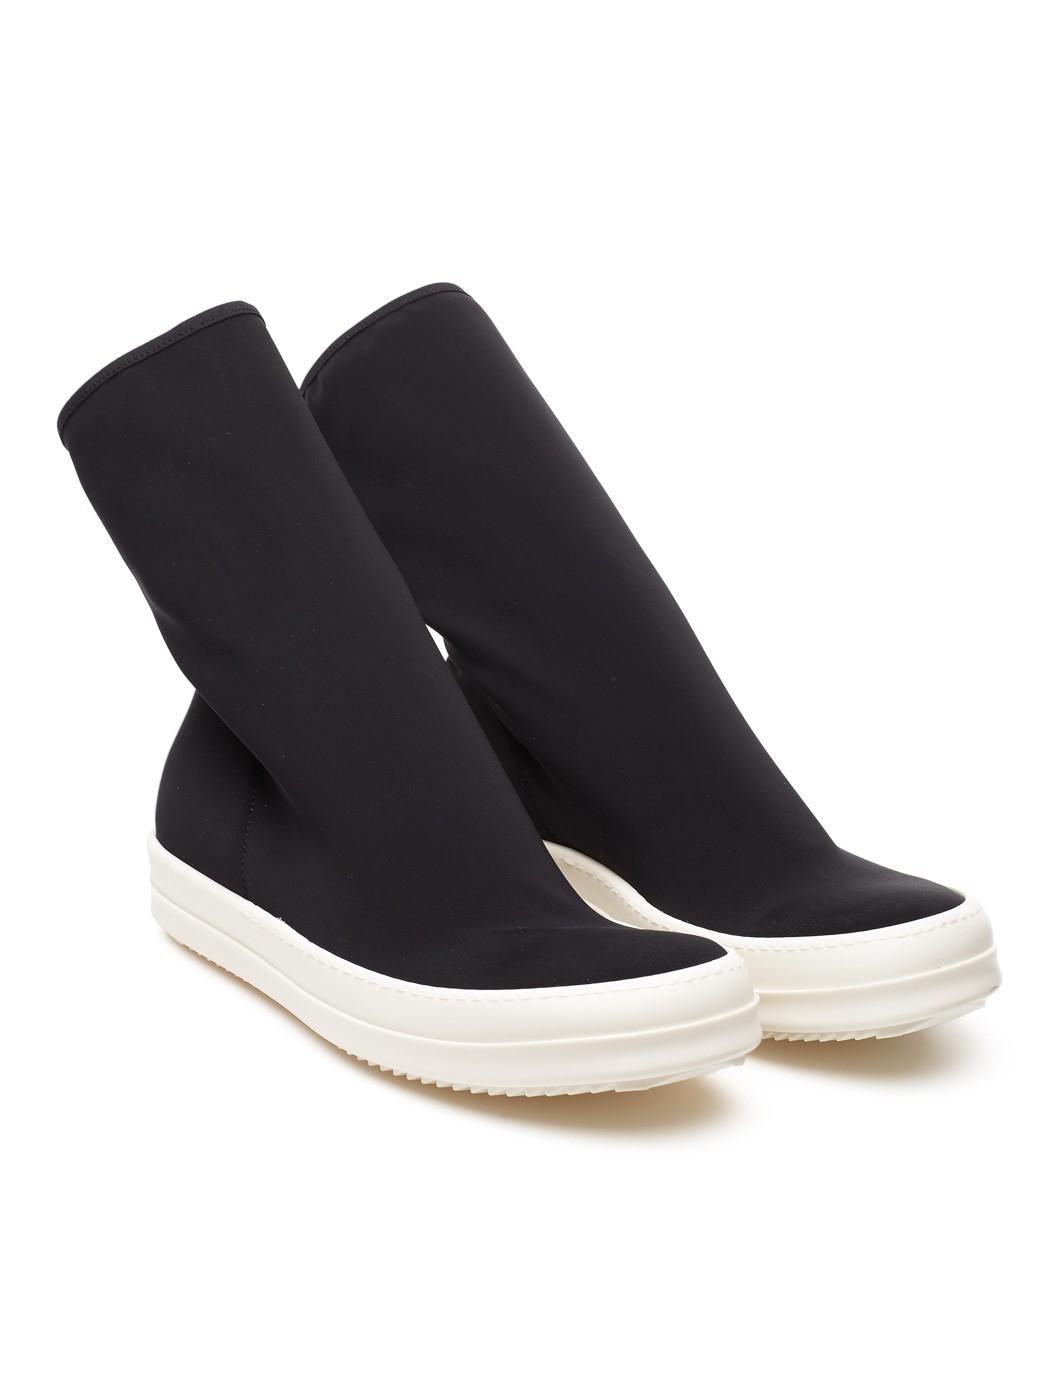 drkshdw by rick owens scuba sock sneakers in black for men lyst. Black Bedroom Furniture Sets. Home Design Ideas